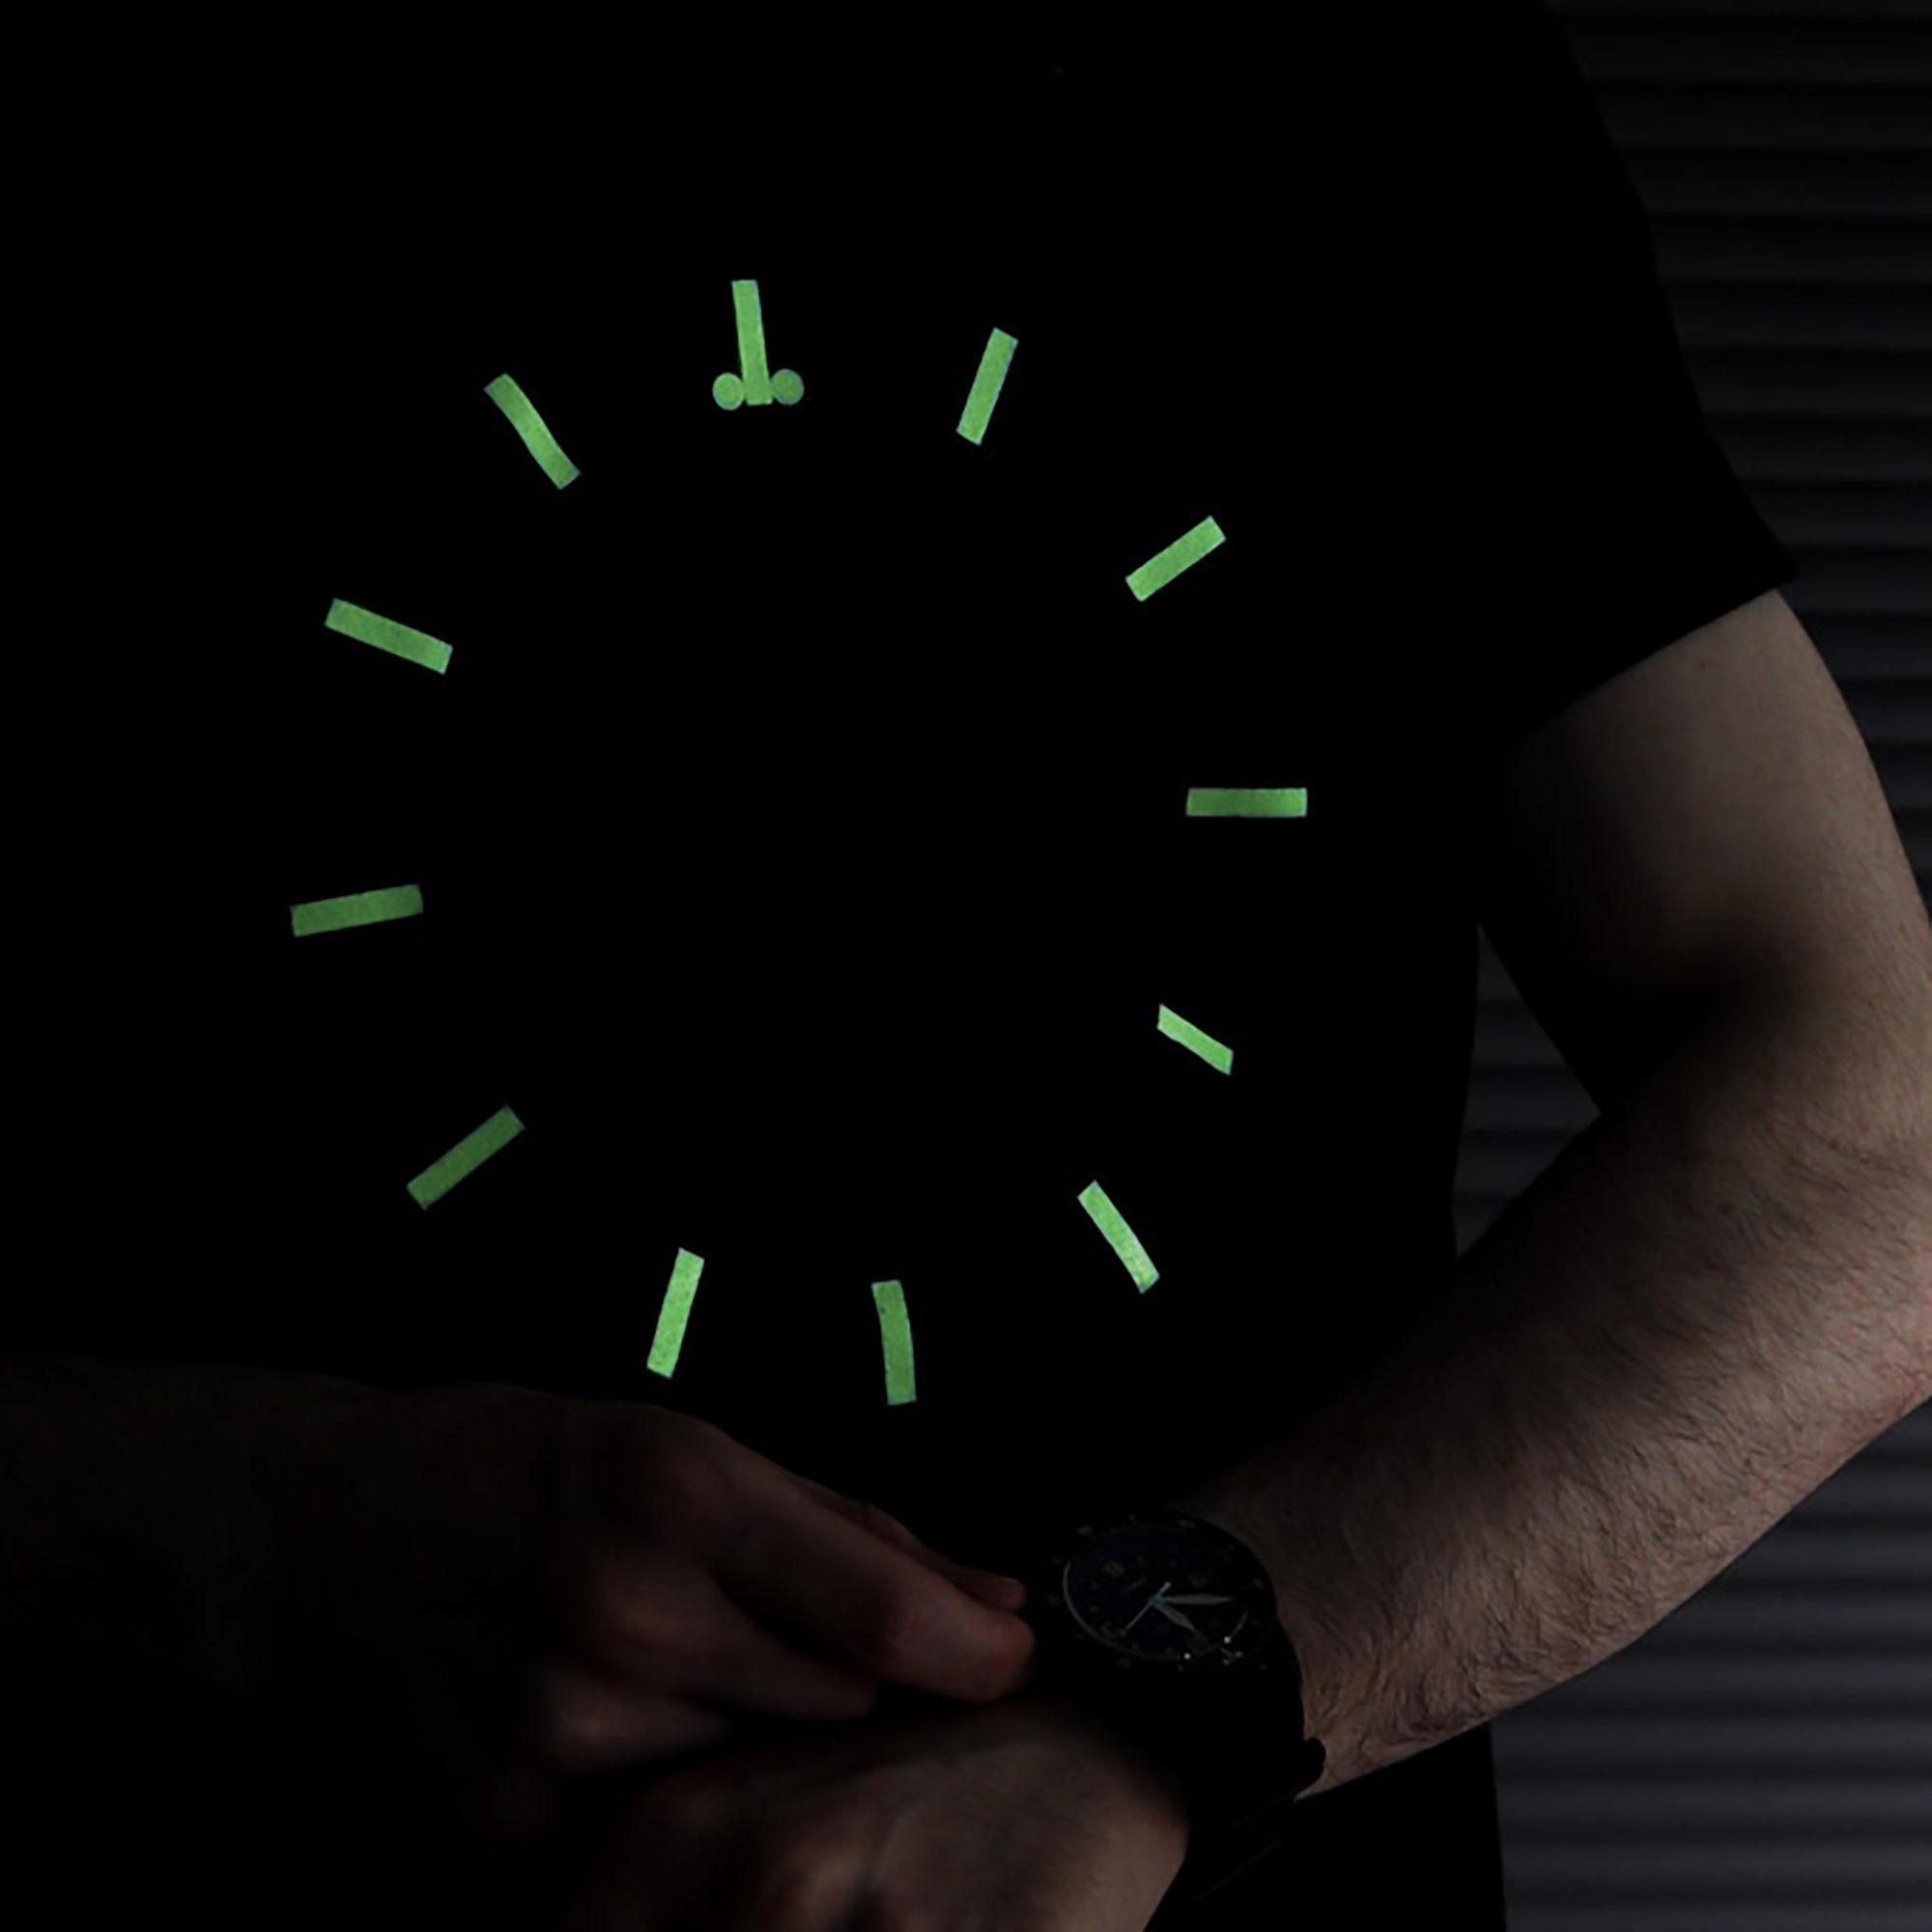 OMEGA Speedmaster Lume T shirt - Image Credit: WatchGecko Online Magazine